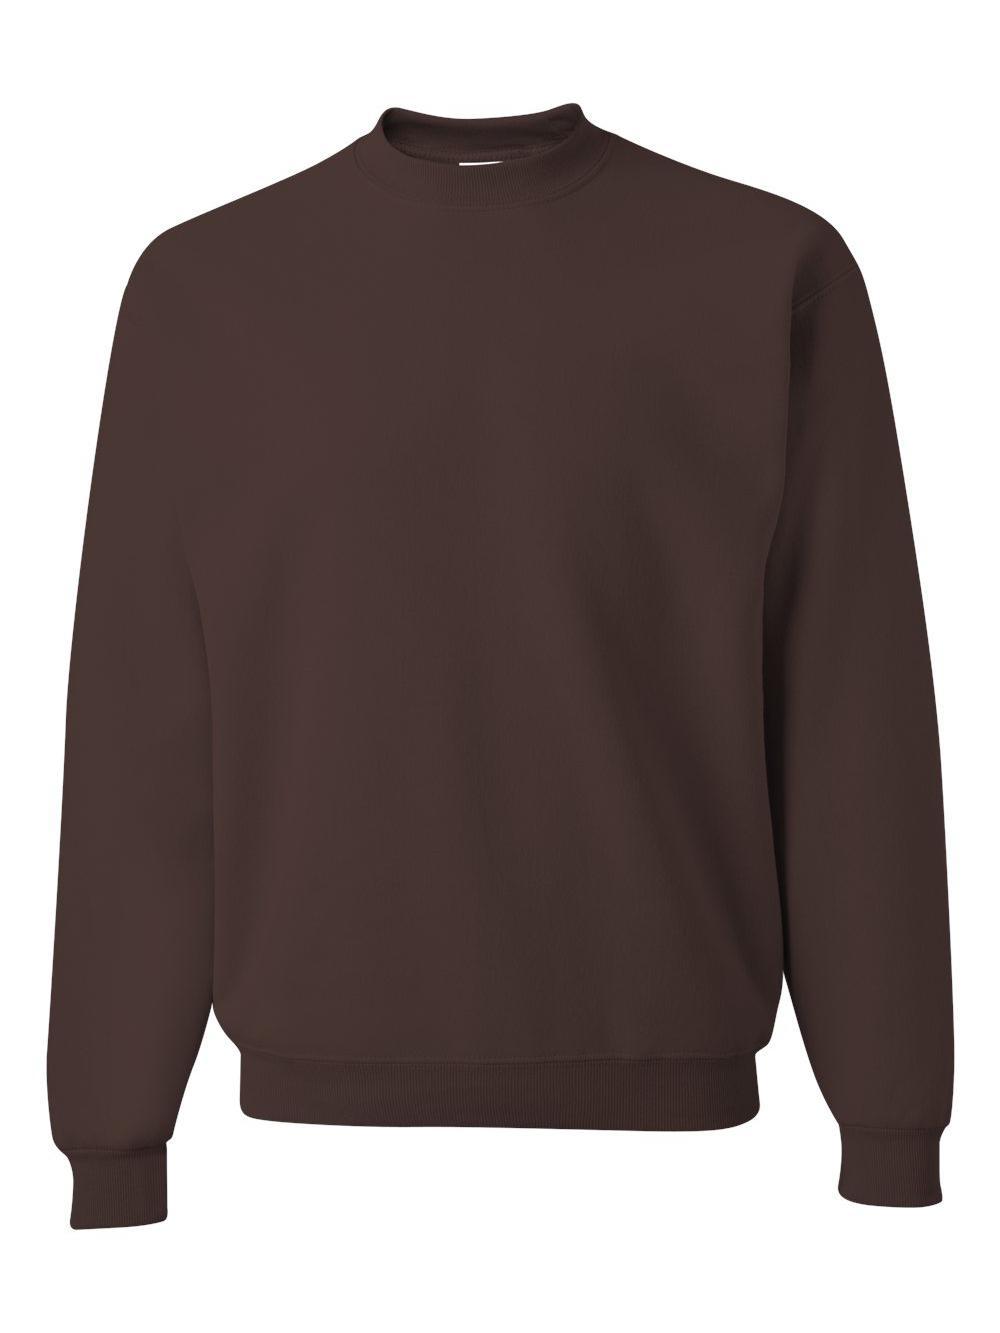 Jerzees-NuBlend-Crewneck-Sweatshirt-562MR thumbnail 24